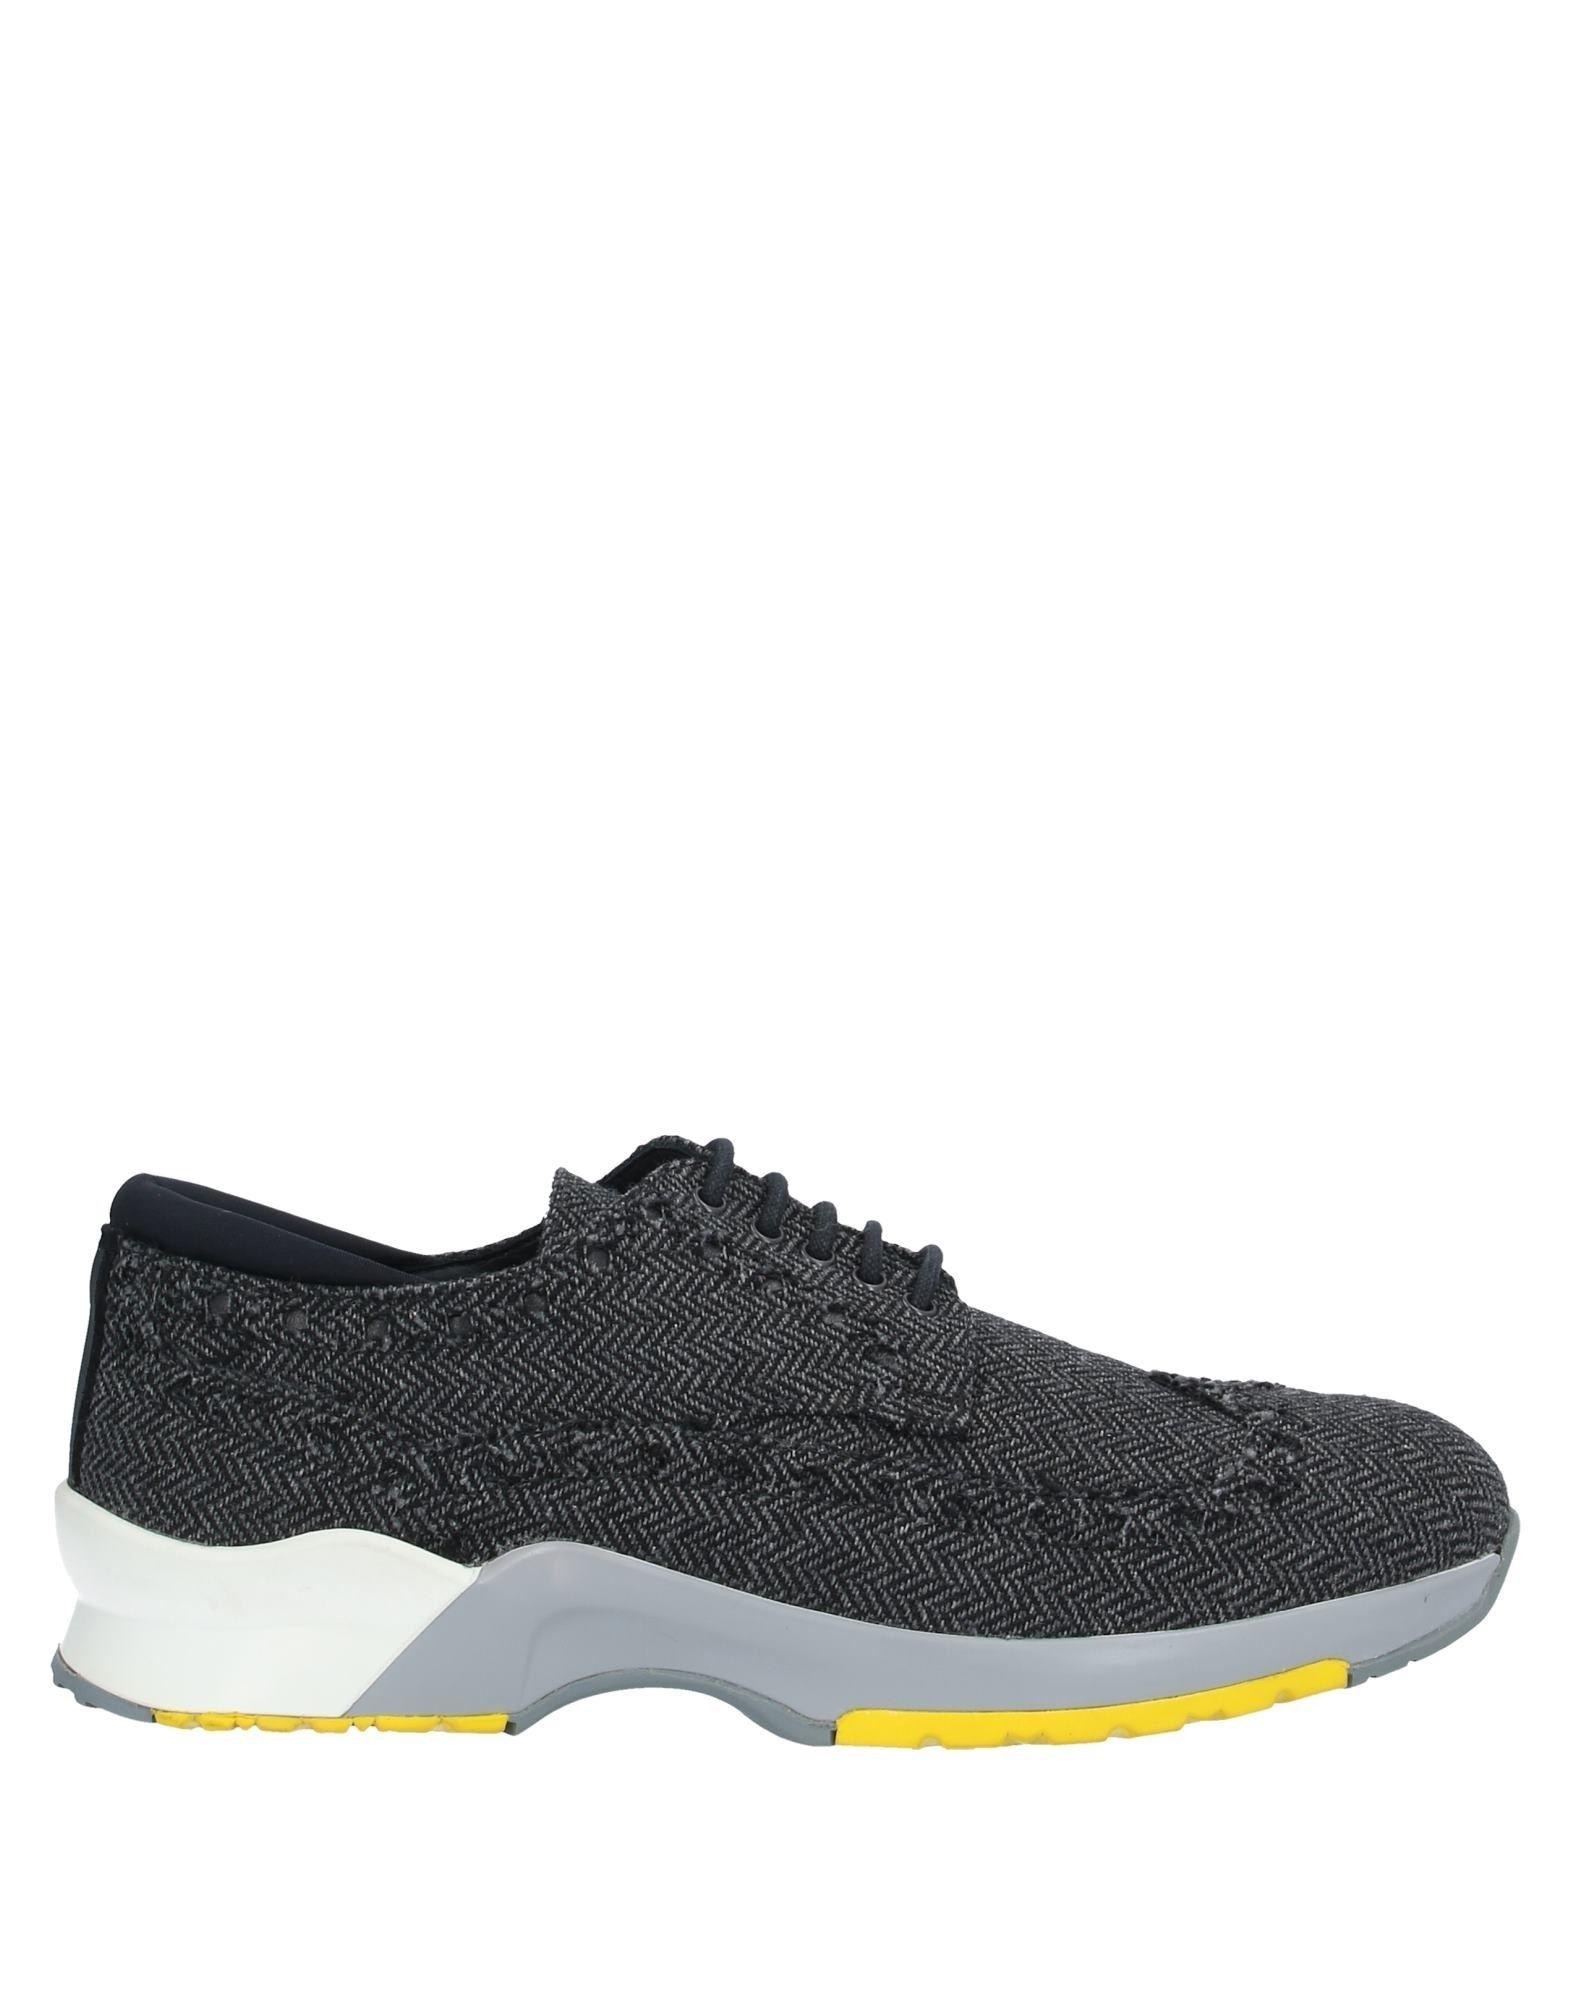 PIRELLI PZERO Обувь на шнурках